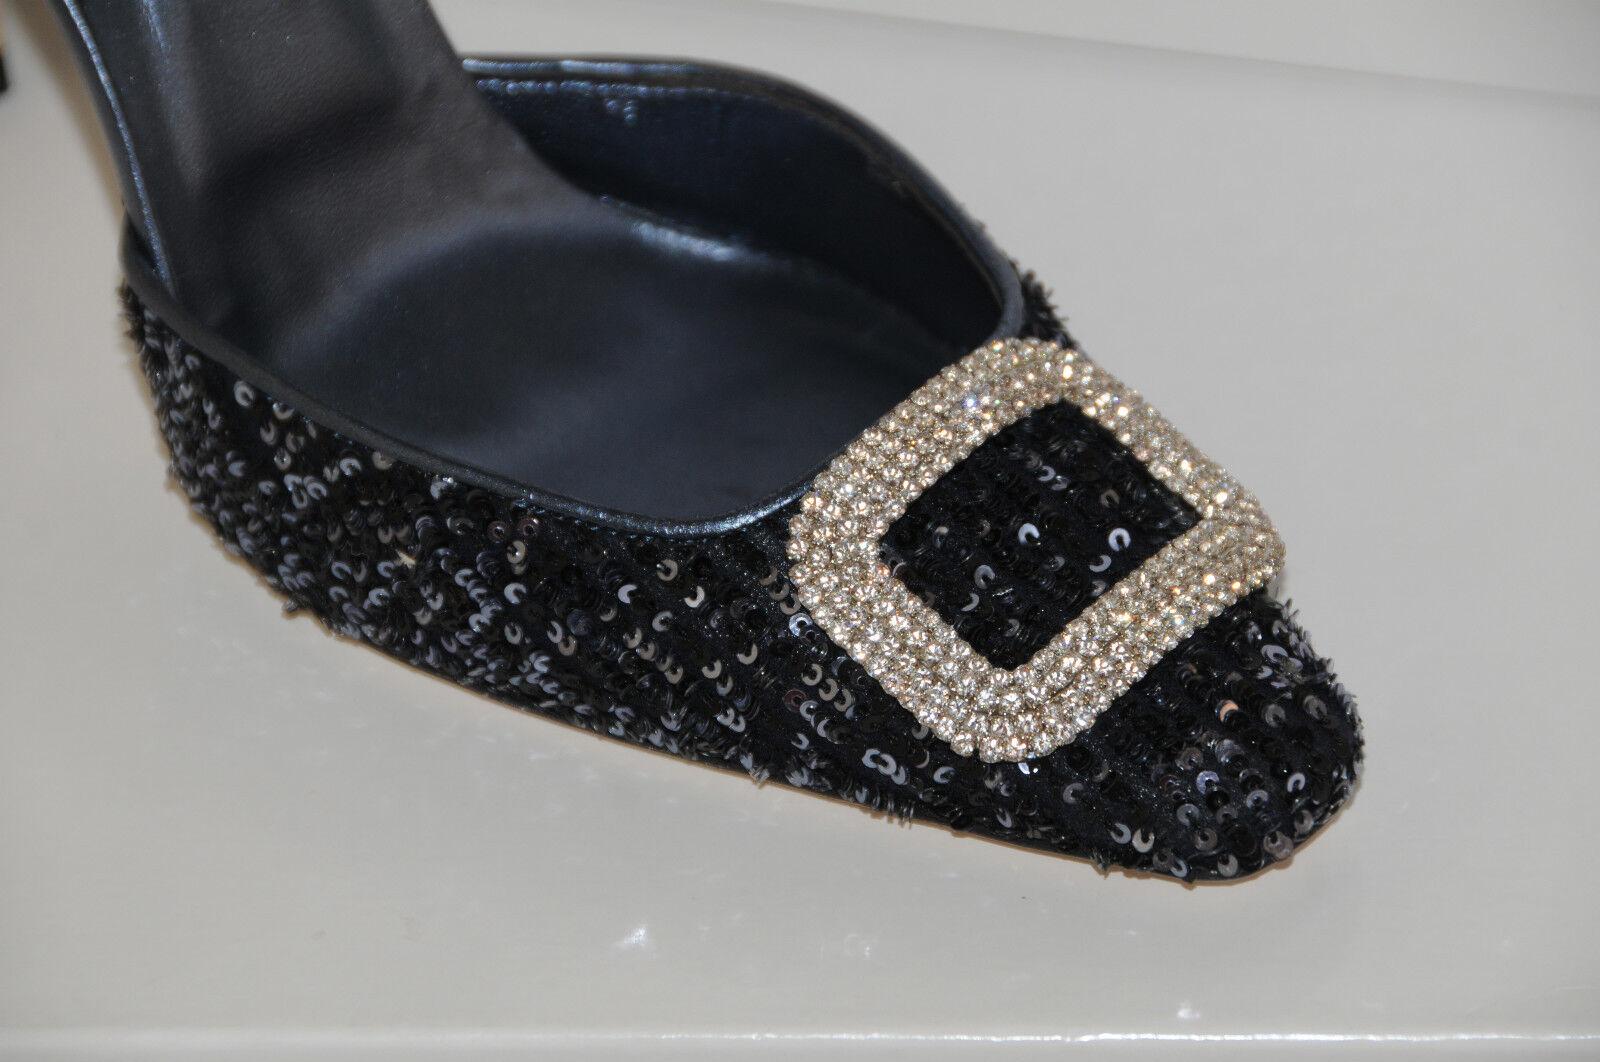 NUOVO MANOLO BLOHNIK VISPONO SLINGS JEWEled SEQUINS  scarpe 41 11 impiccaisi  n ° 1 online